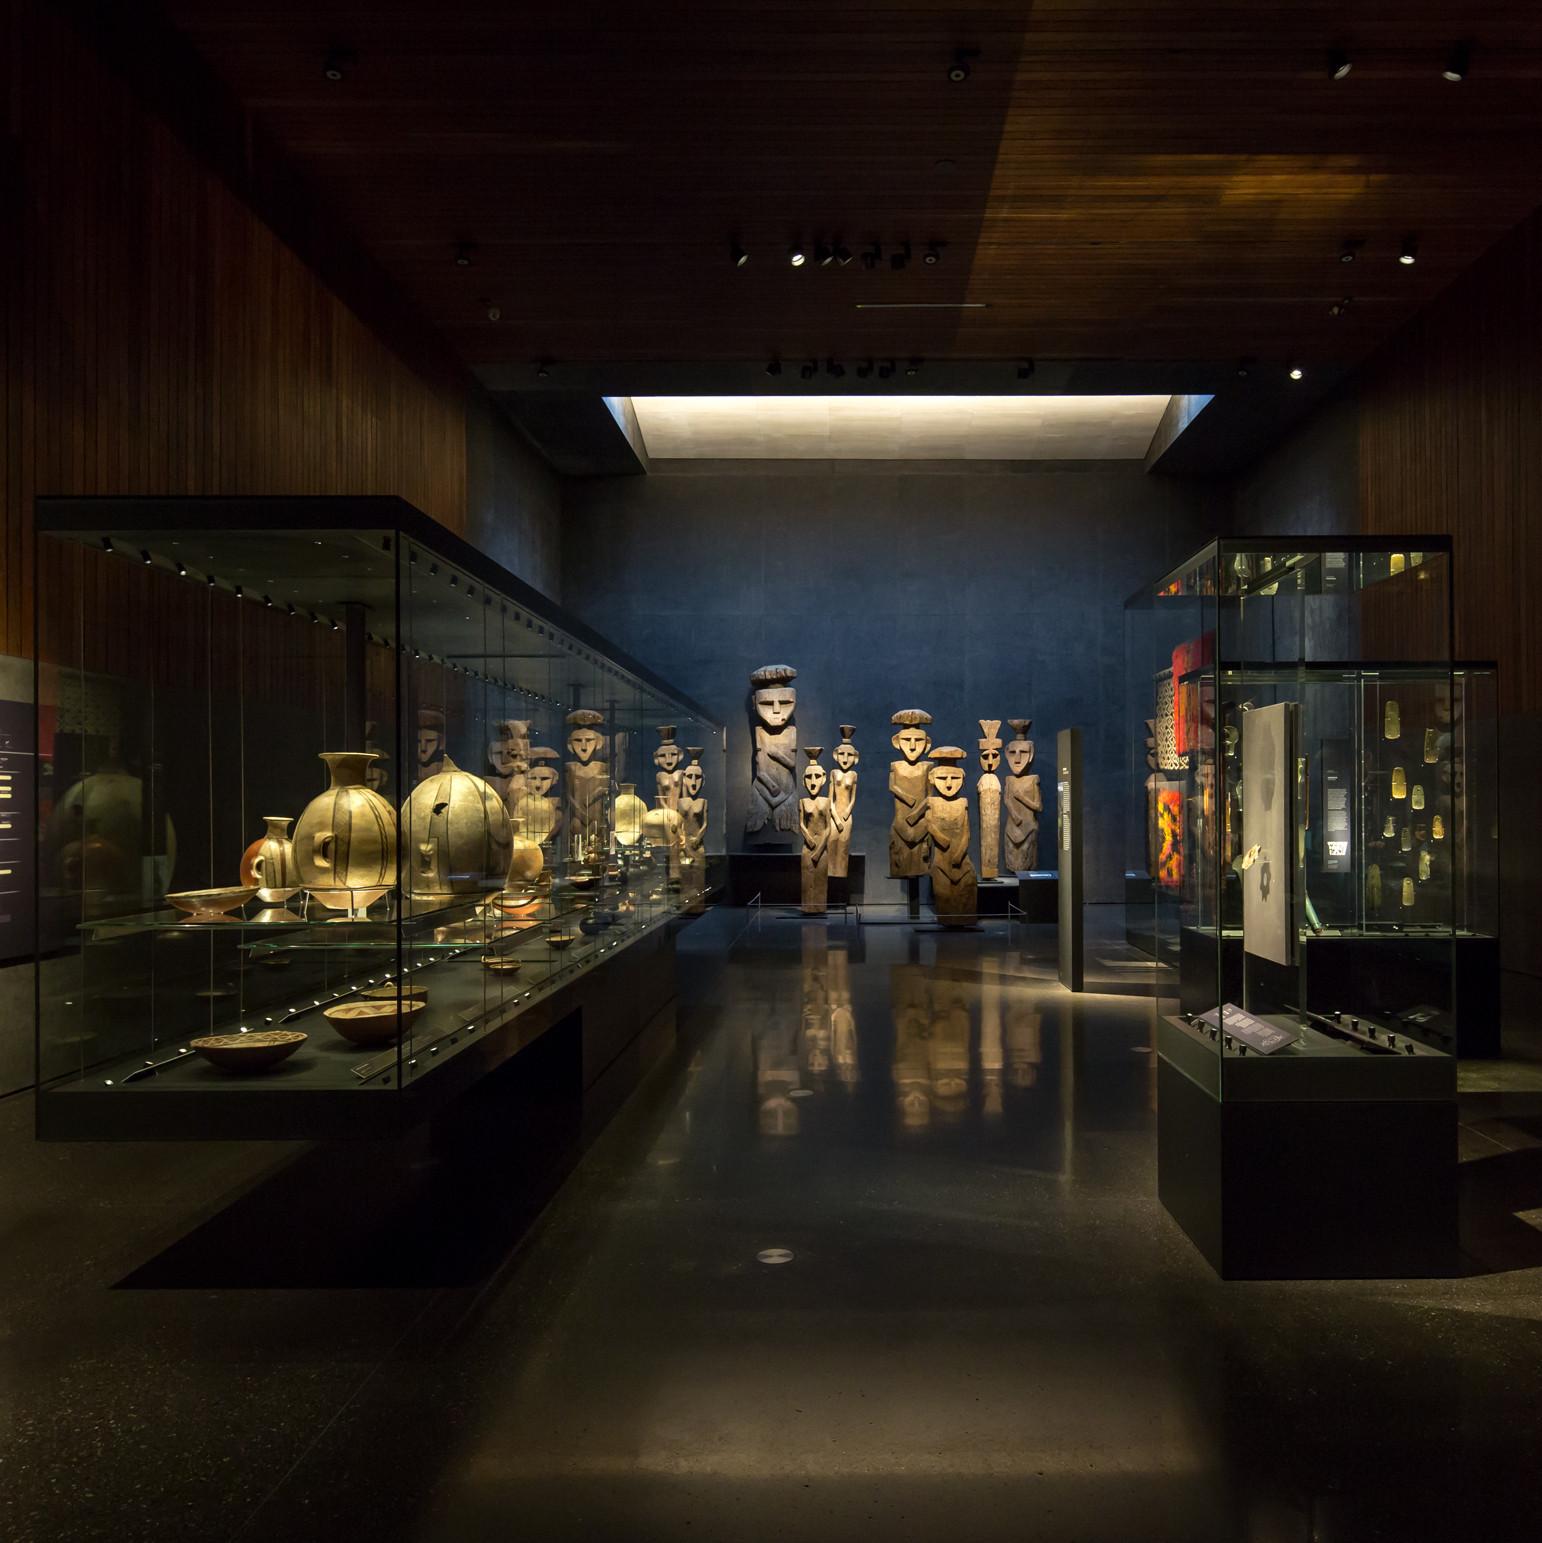 Museo Chileno de Arte Precolombino, Chile; por Limarí Lighting Design © Aryeh Kornfeld. Image Cortesia de Lamp Lighting